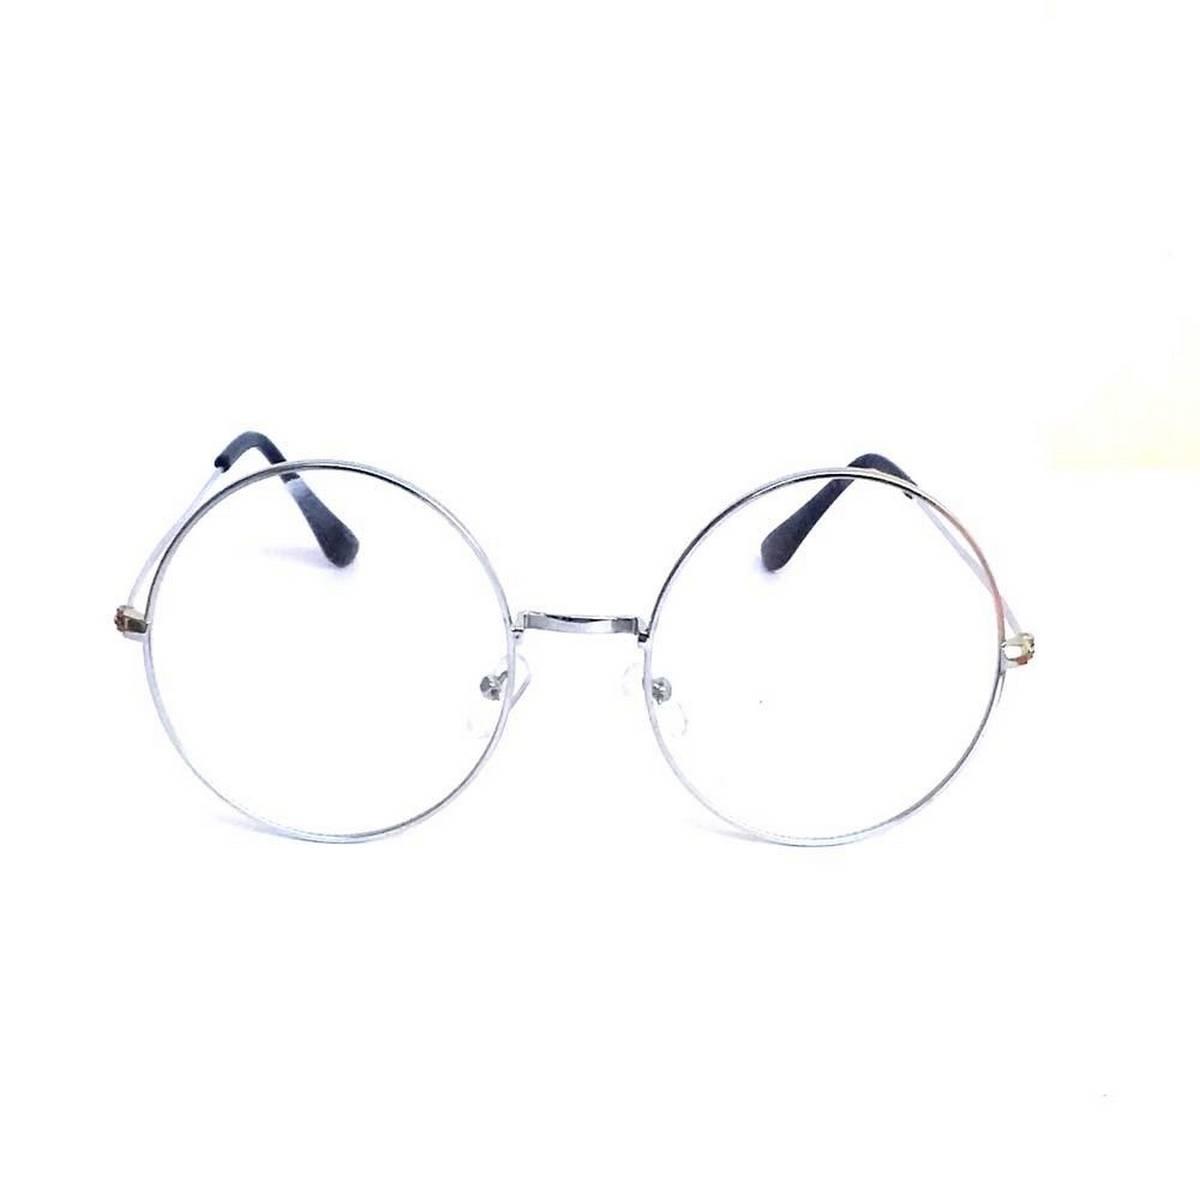 Sunglasses for  women Round Circle excellent transparent lens Gold Metal frame stylish Sun glasses